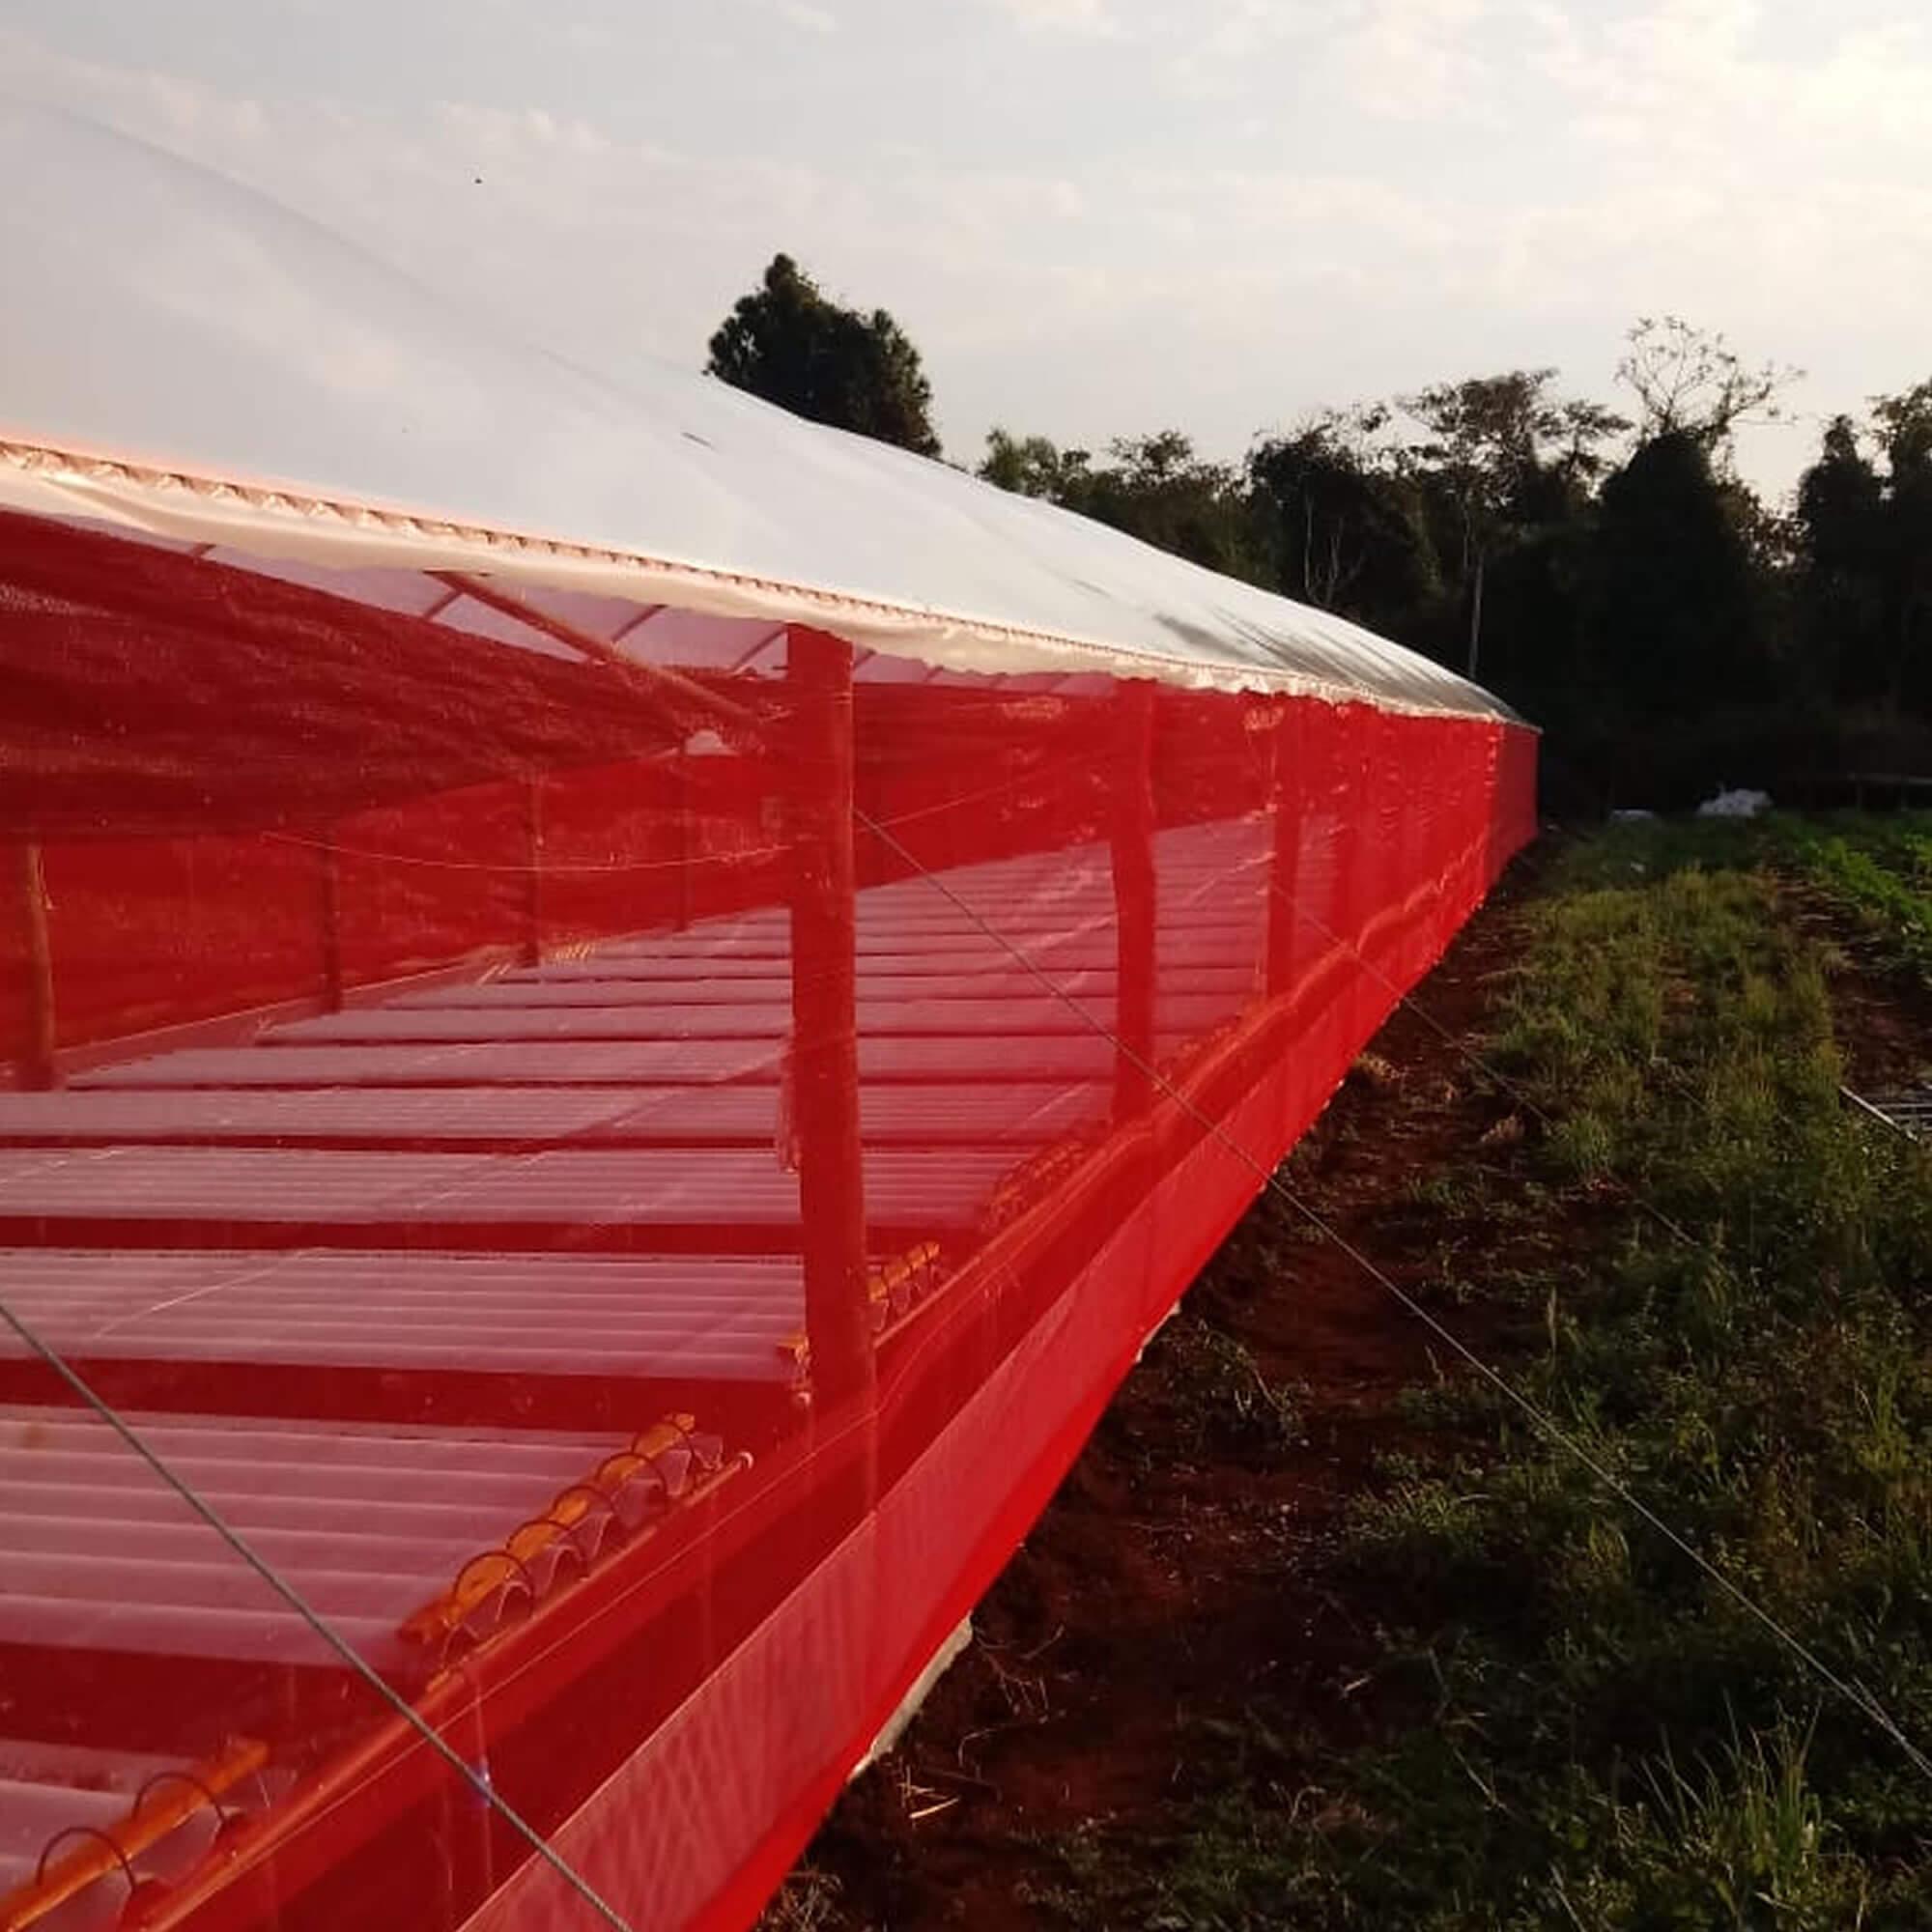 Tela de Sombreamento Vermelha 20% - 3 x 30 metros